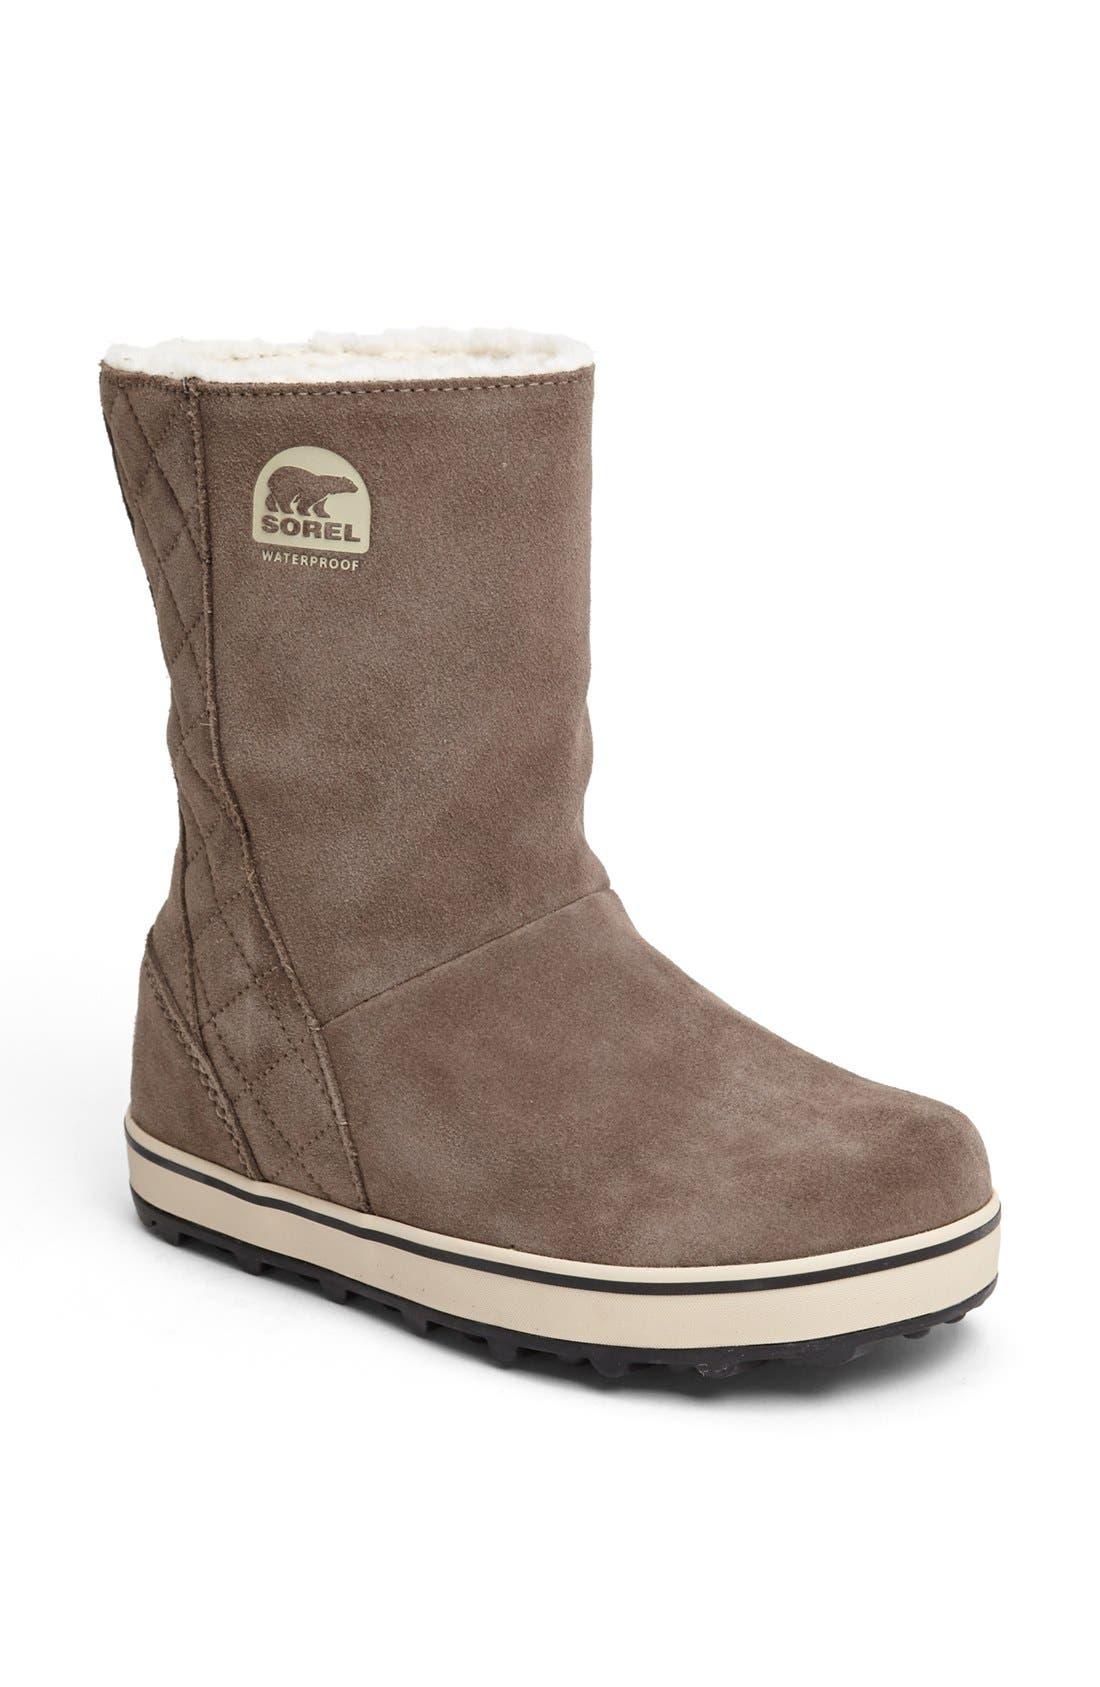 Main Image - SOREL 'Glacy™' Waterproof Boot